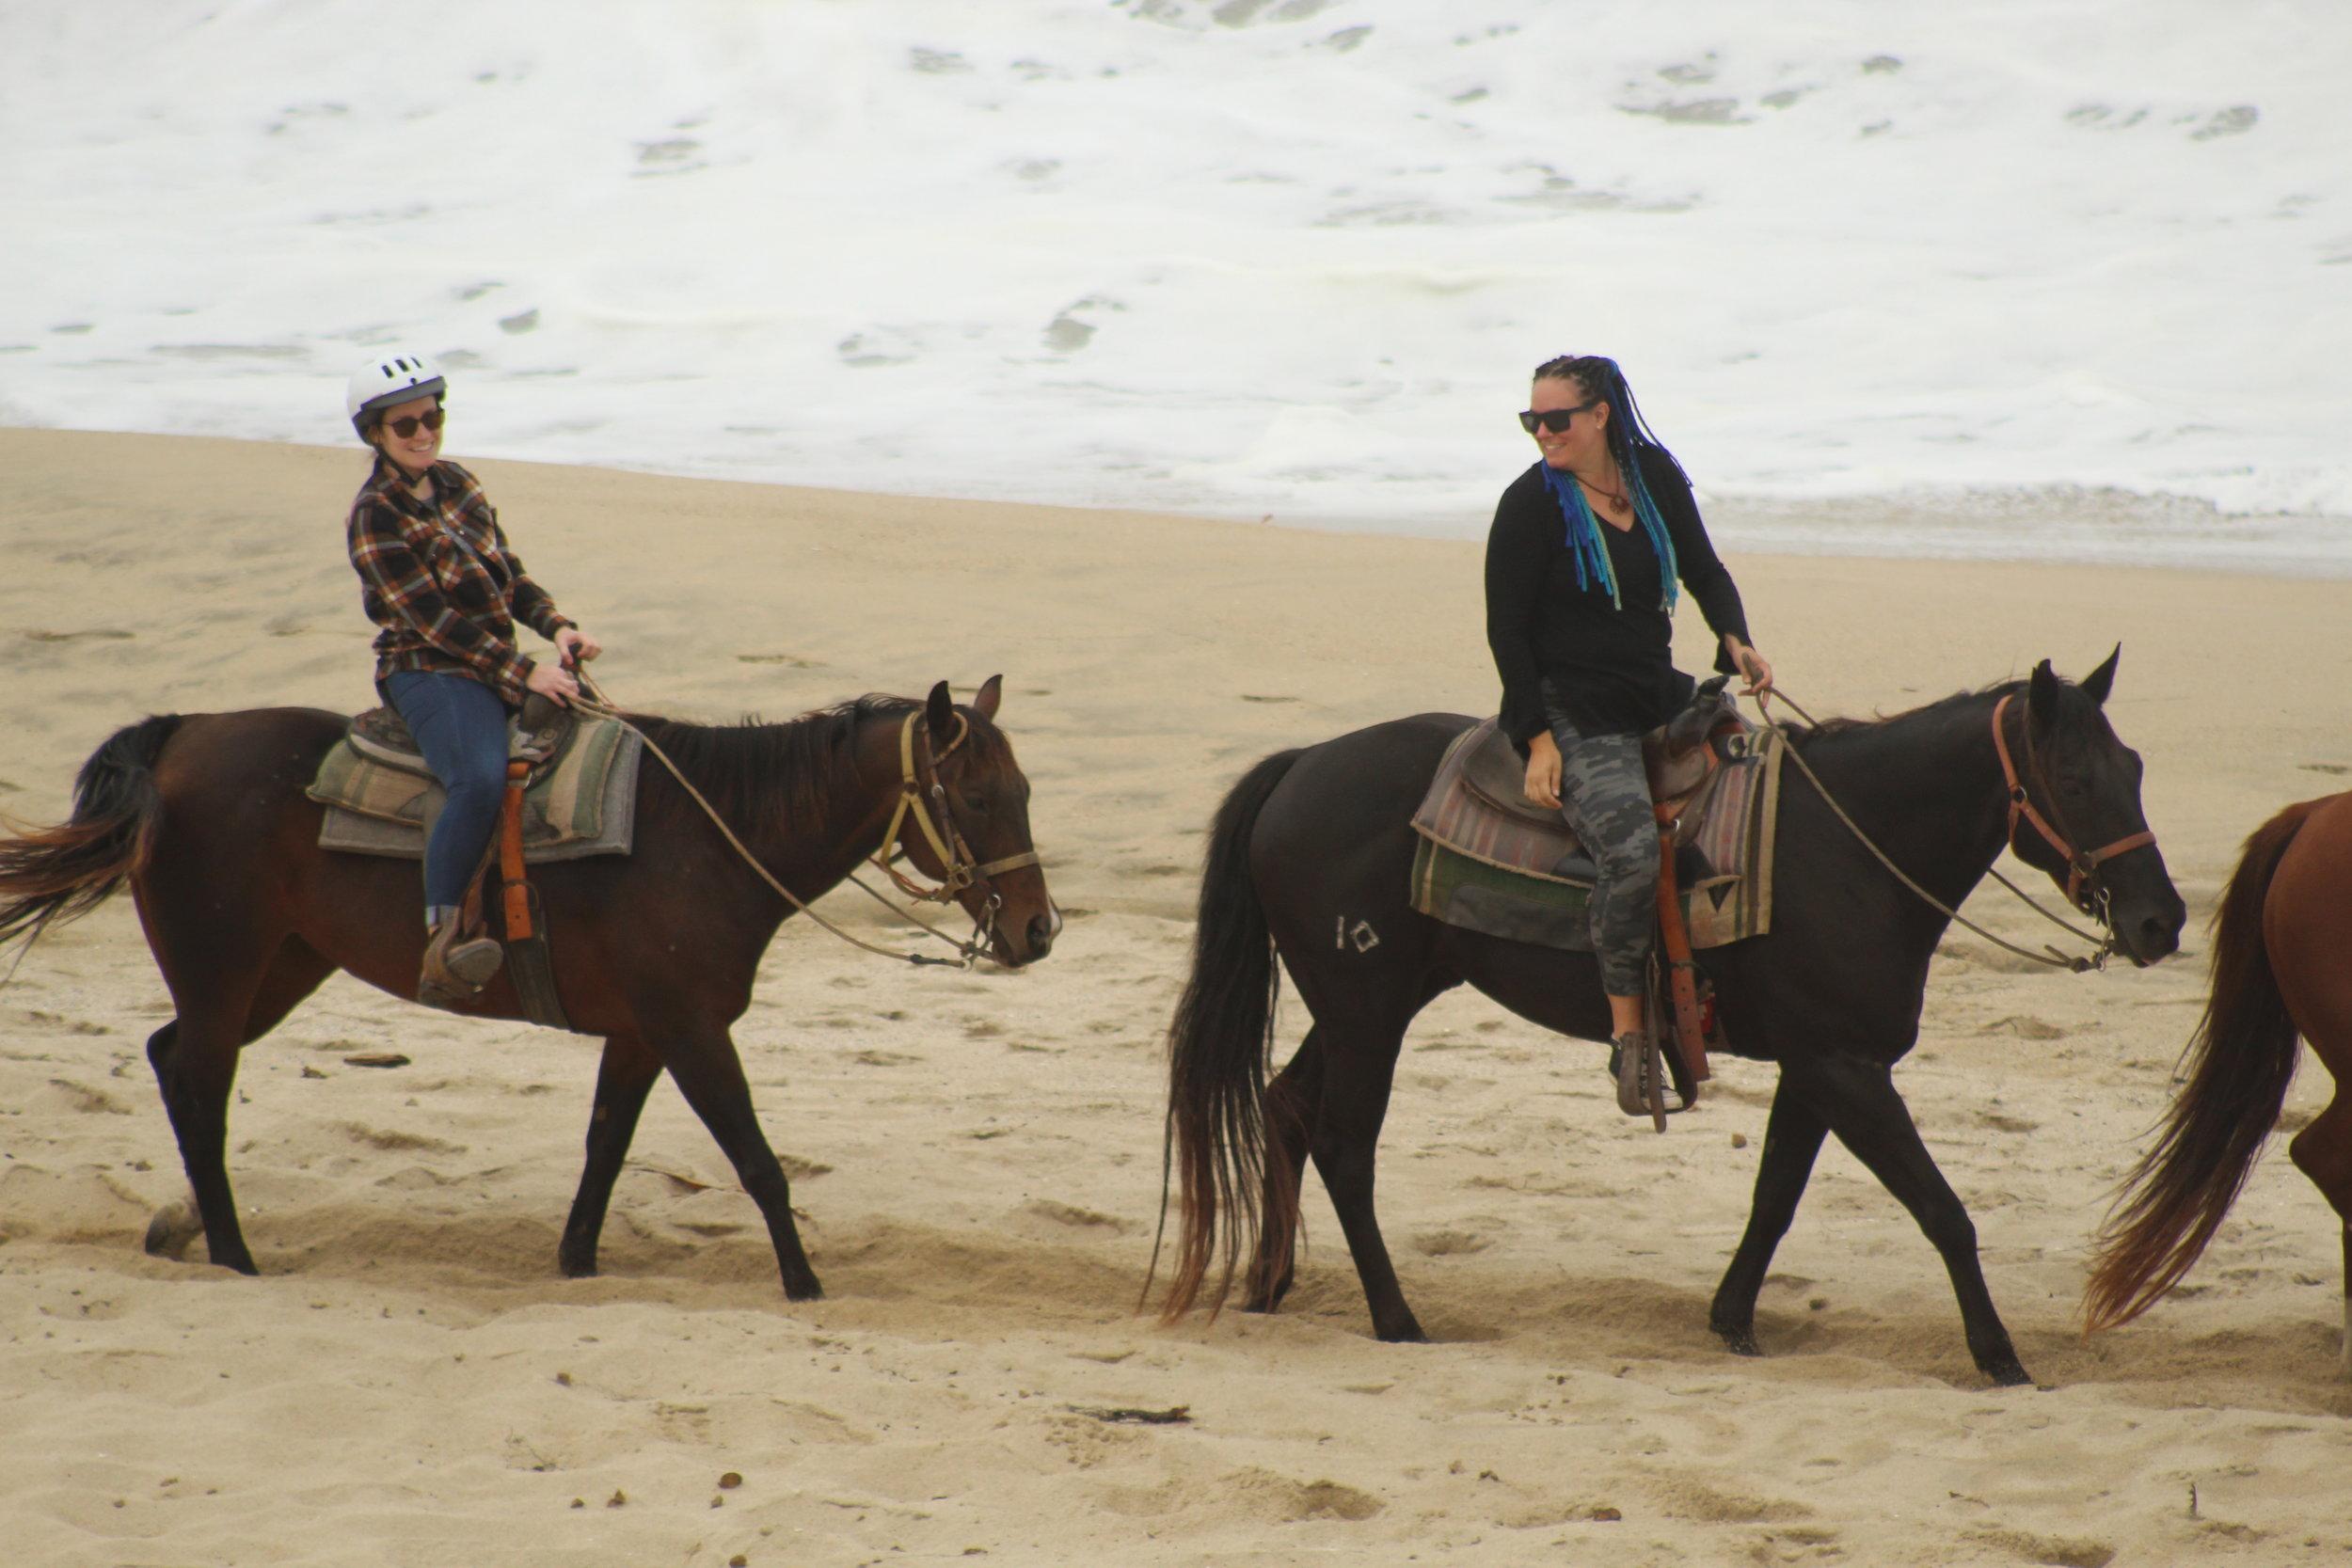 Horseback riding in Half Moon Bay with my friend Jocelyn